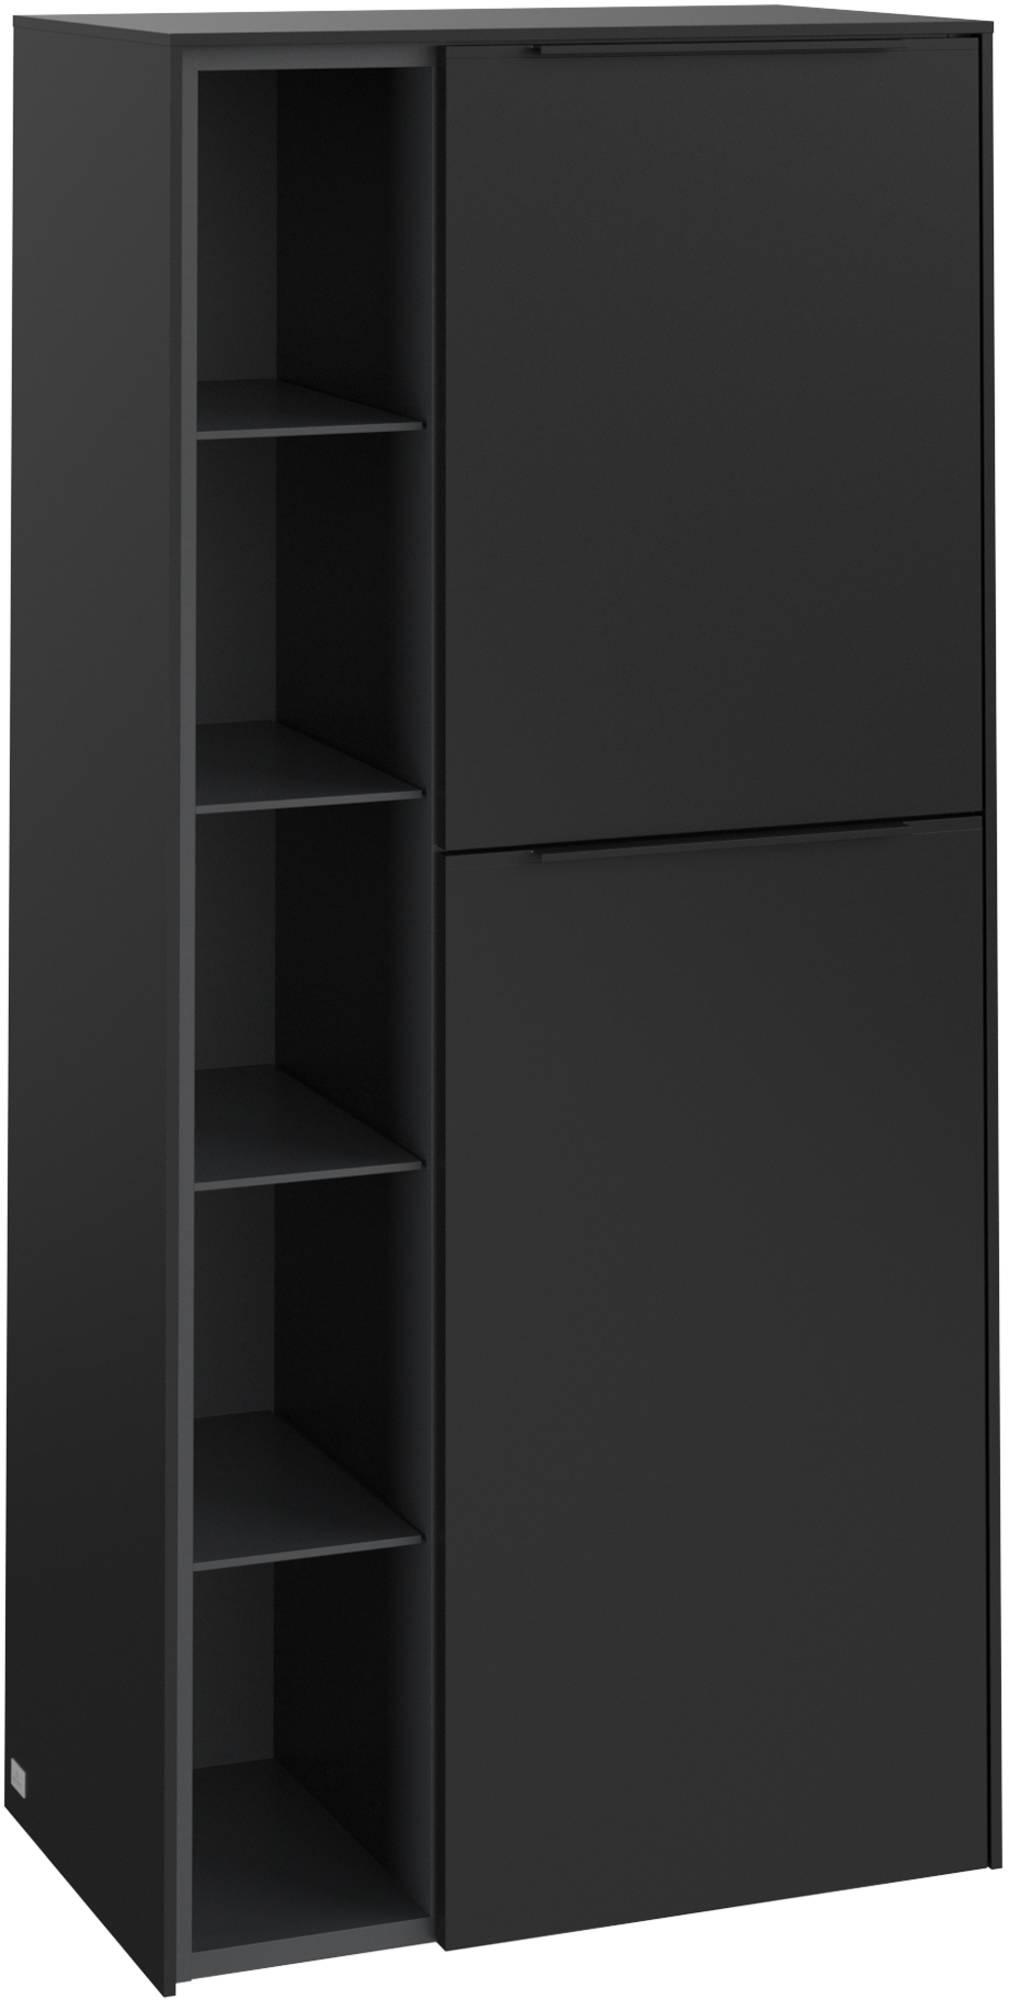 Villeroy & Boch Subway 3.0 Middenkast 57,4x36,2x120 cm Volcano Black